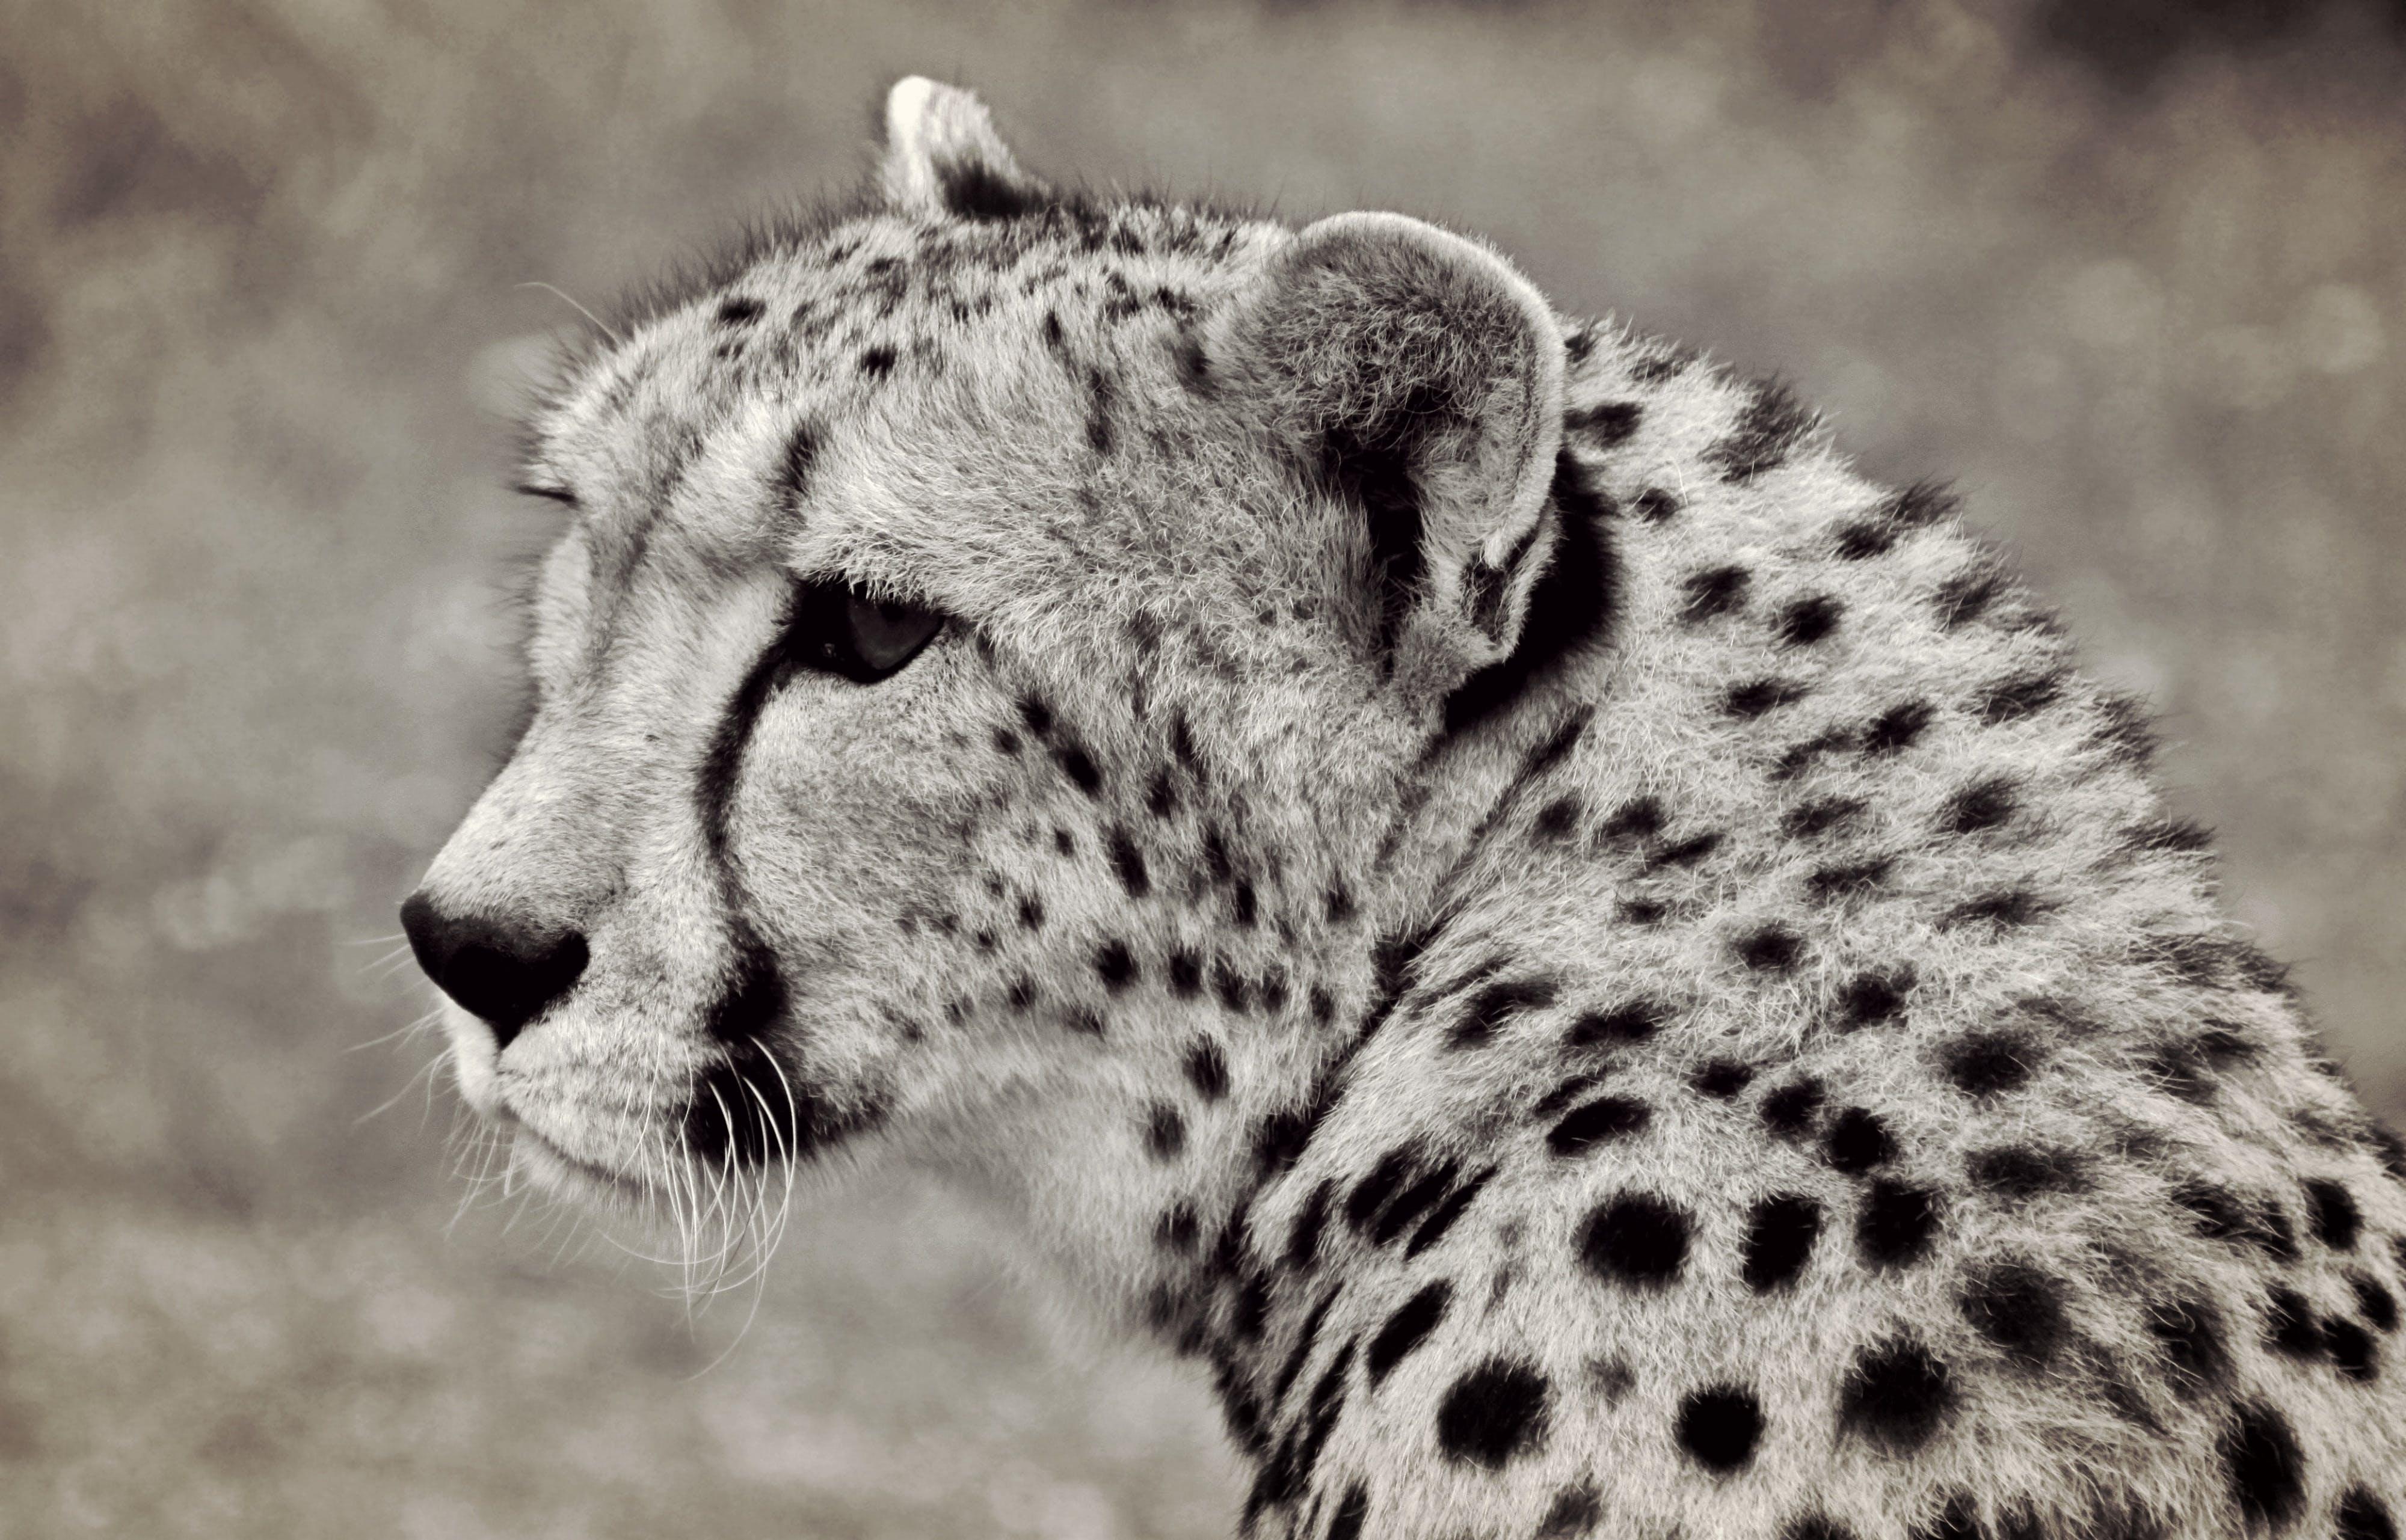 animal, animal photography, animal portrait